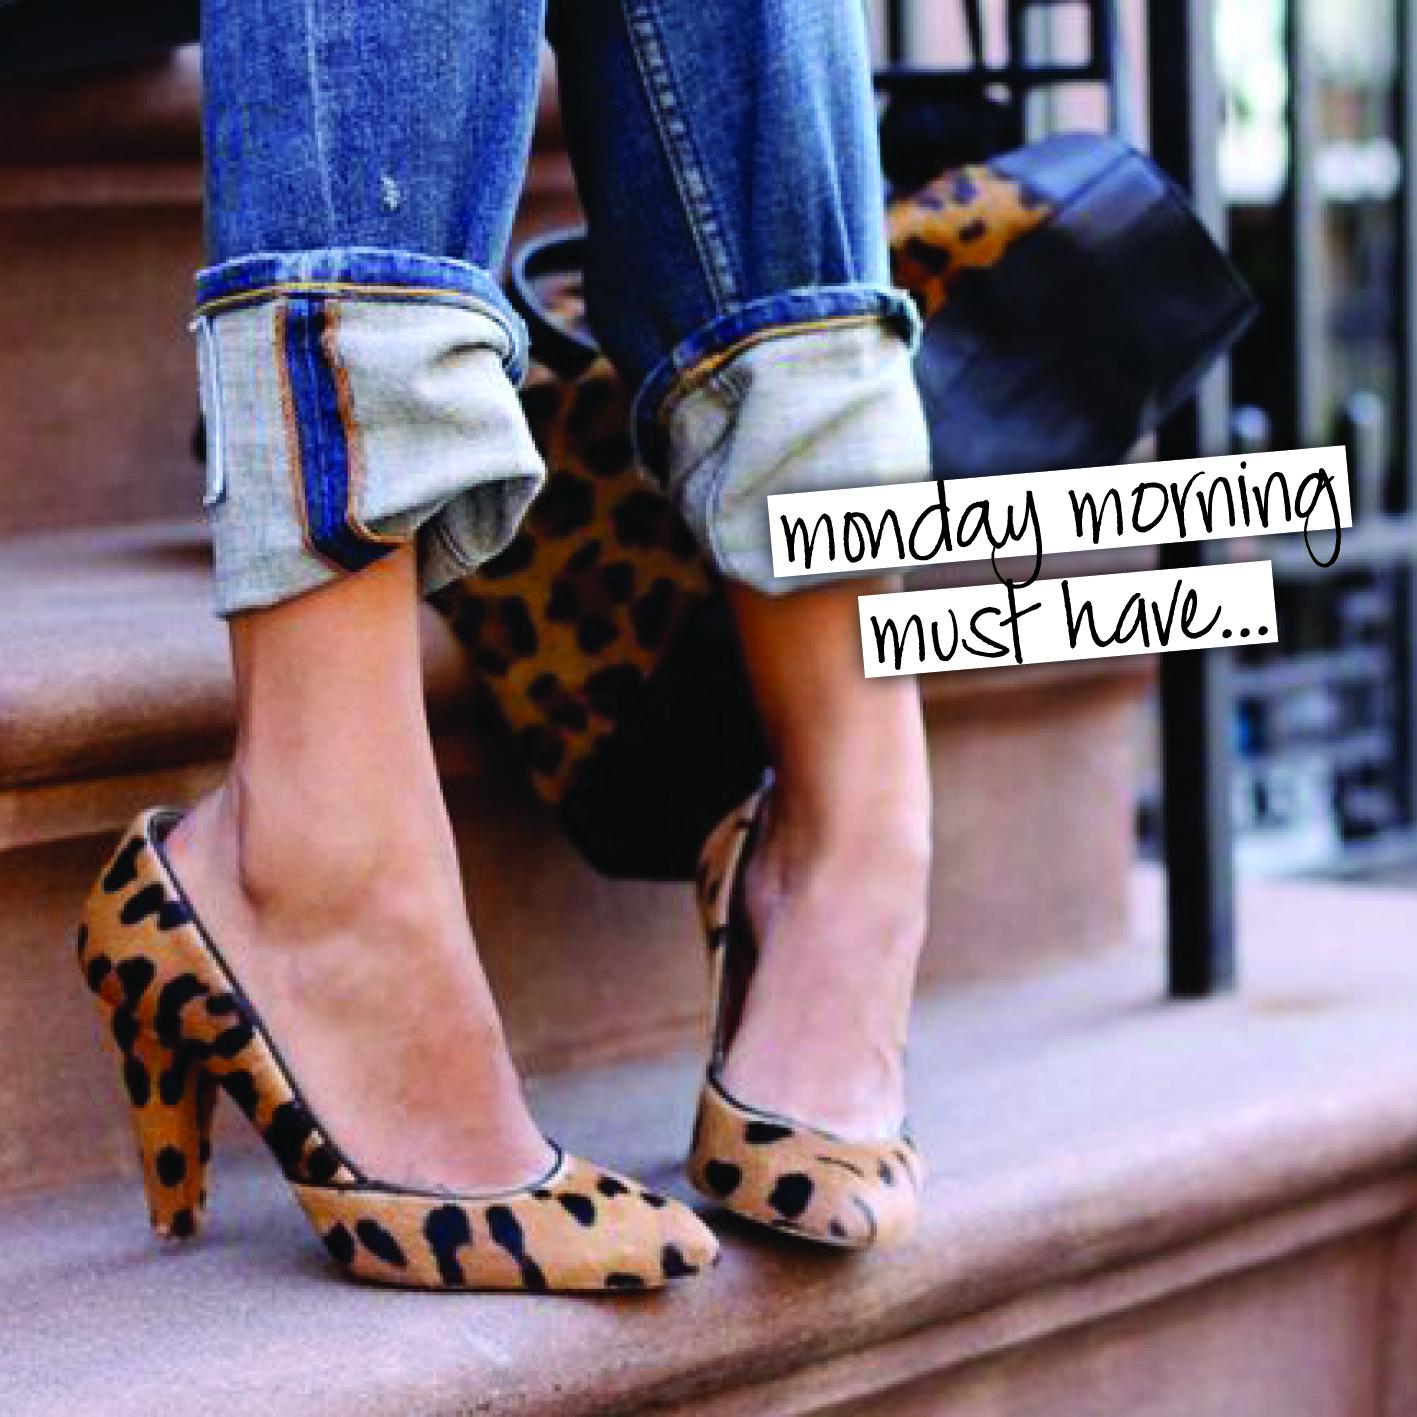 MondayLeopard